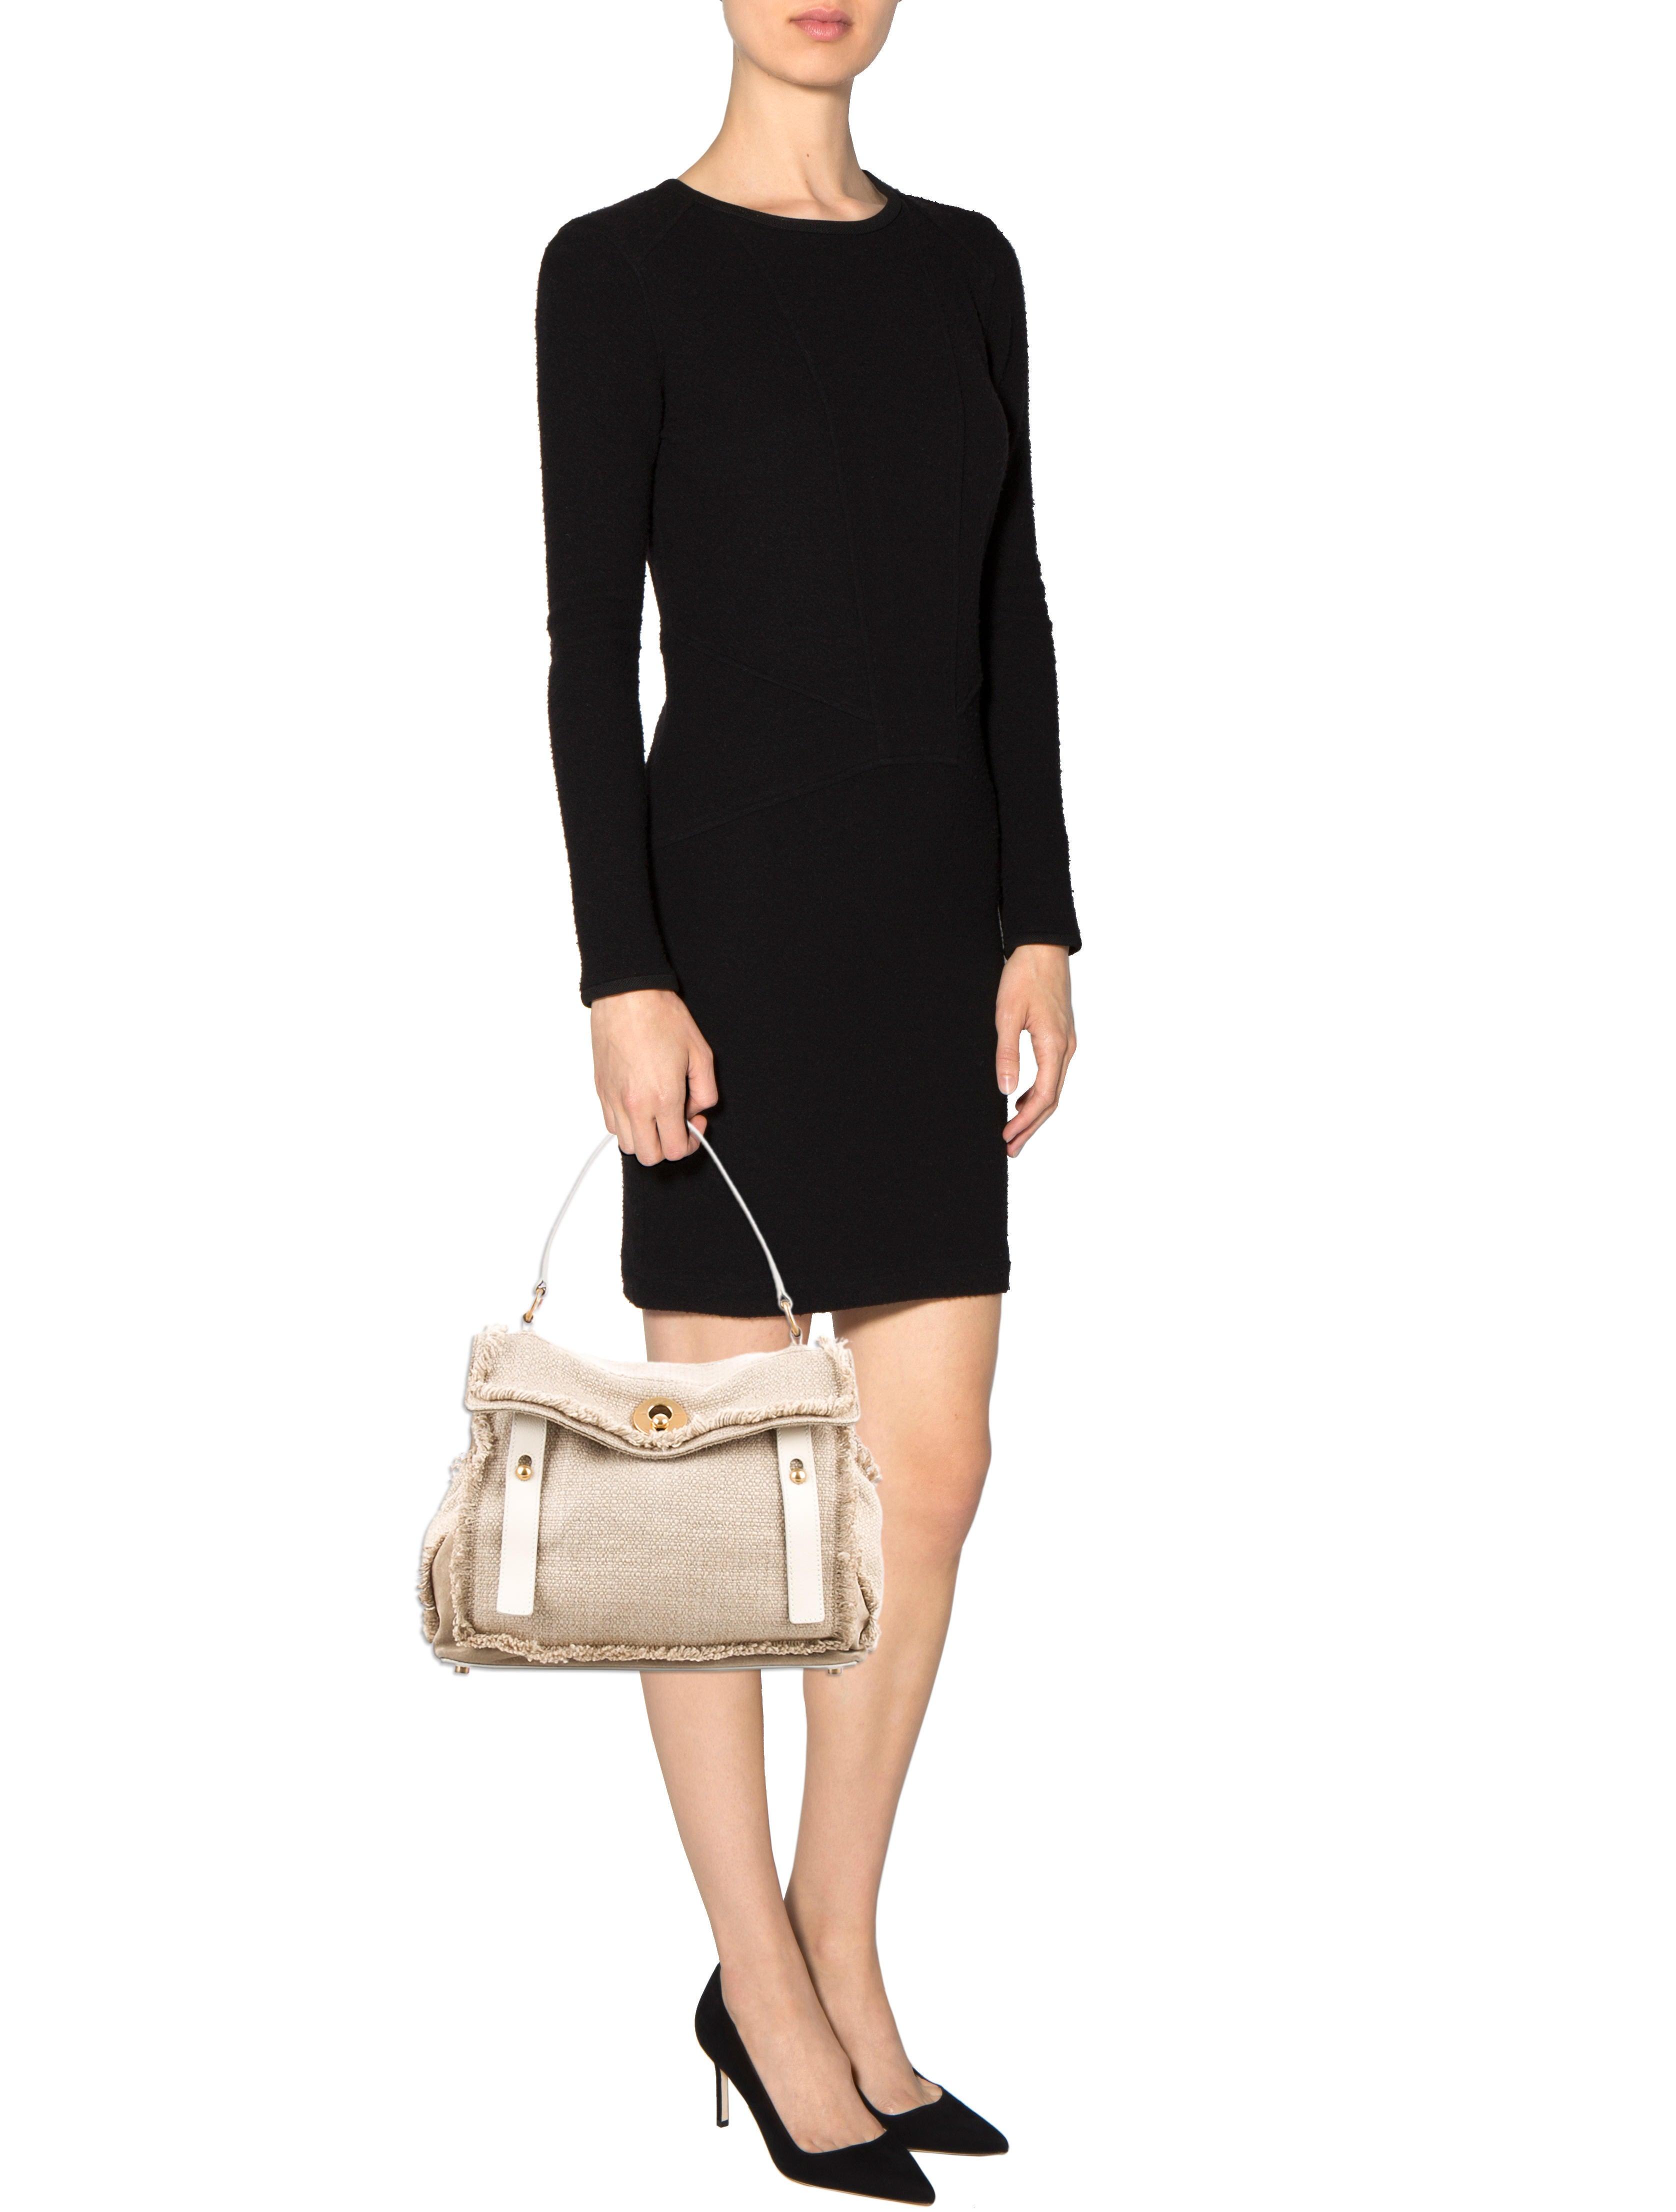 Yves Saint Laurent Raffia Muse Two Bag - Handbags - YVE40311 | The ...